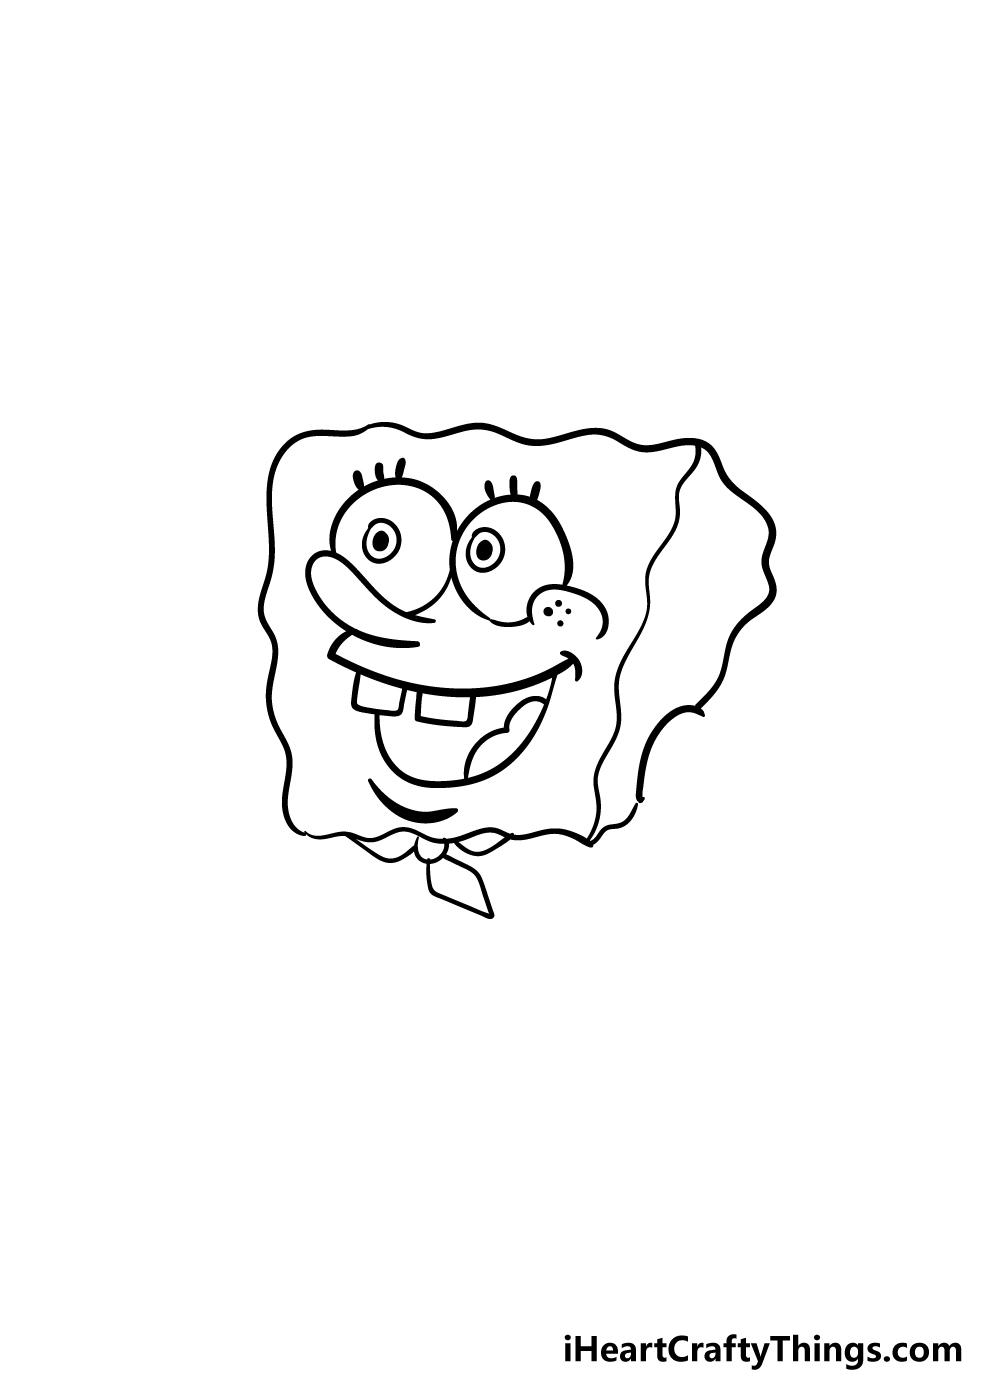 spongebob drawing step 4